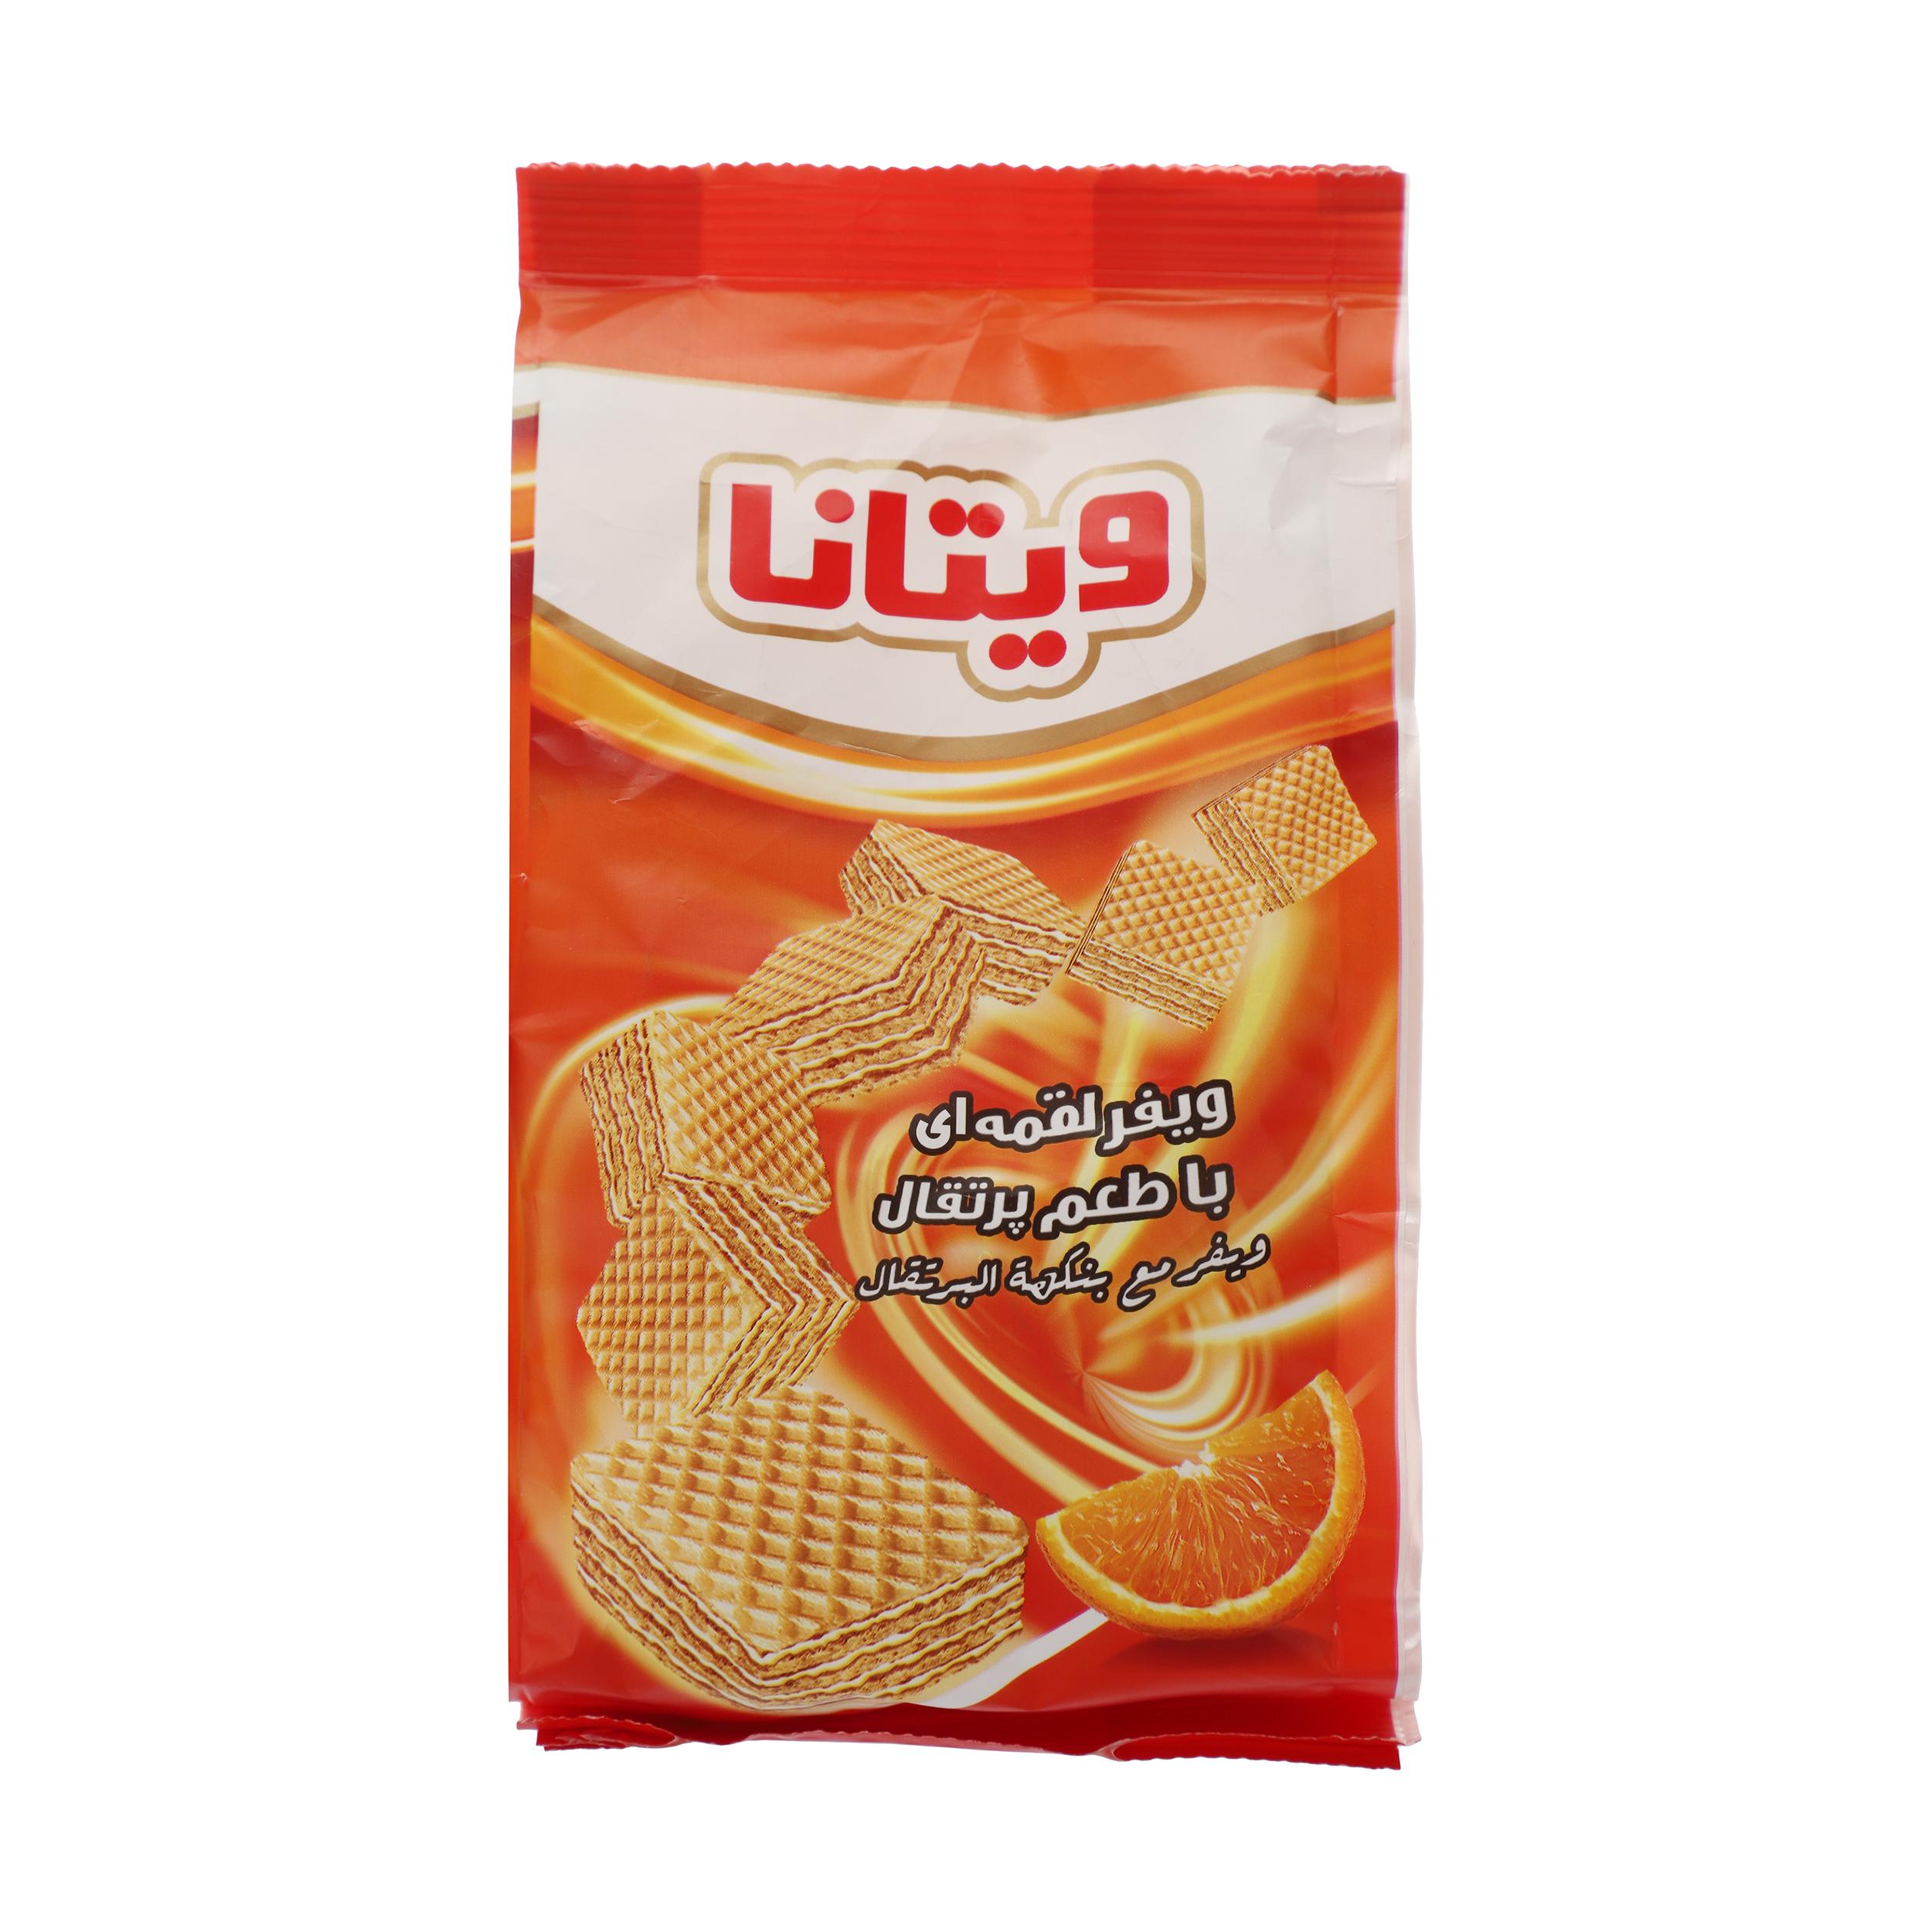 ویفر لقمه ای ویتانا با طعم پرتقال - 105 گرم